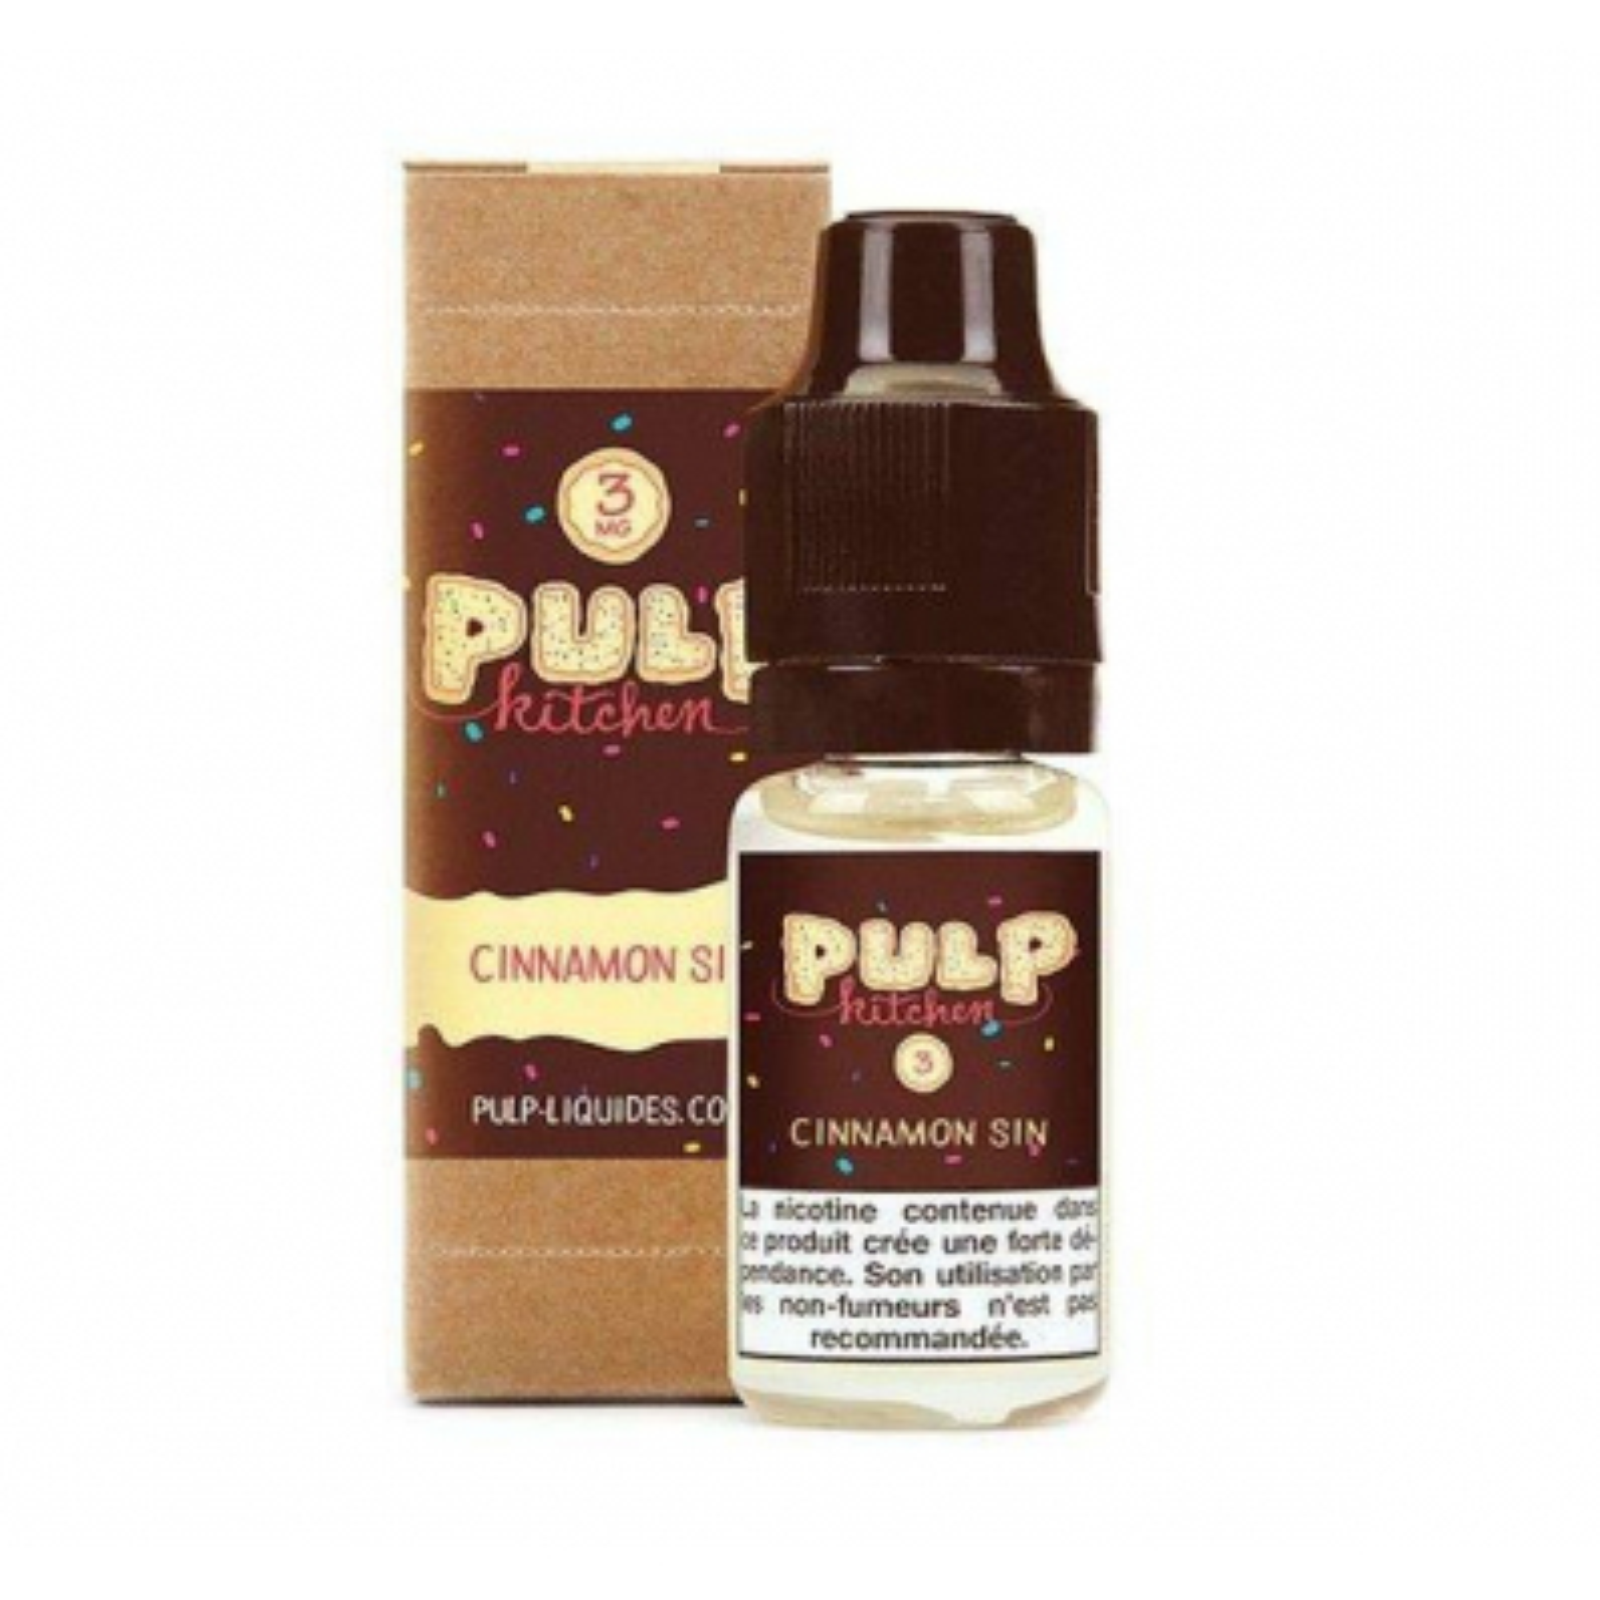 Cinnamon Sin - Pulp